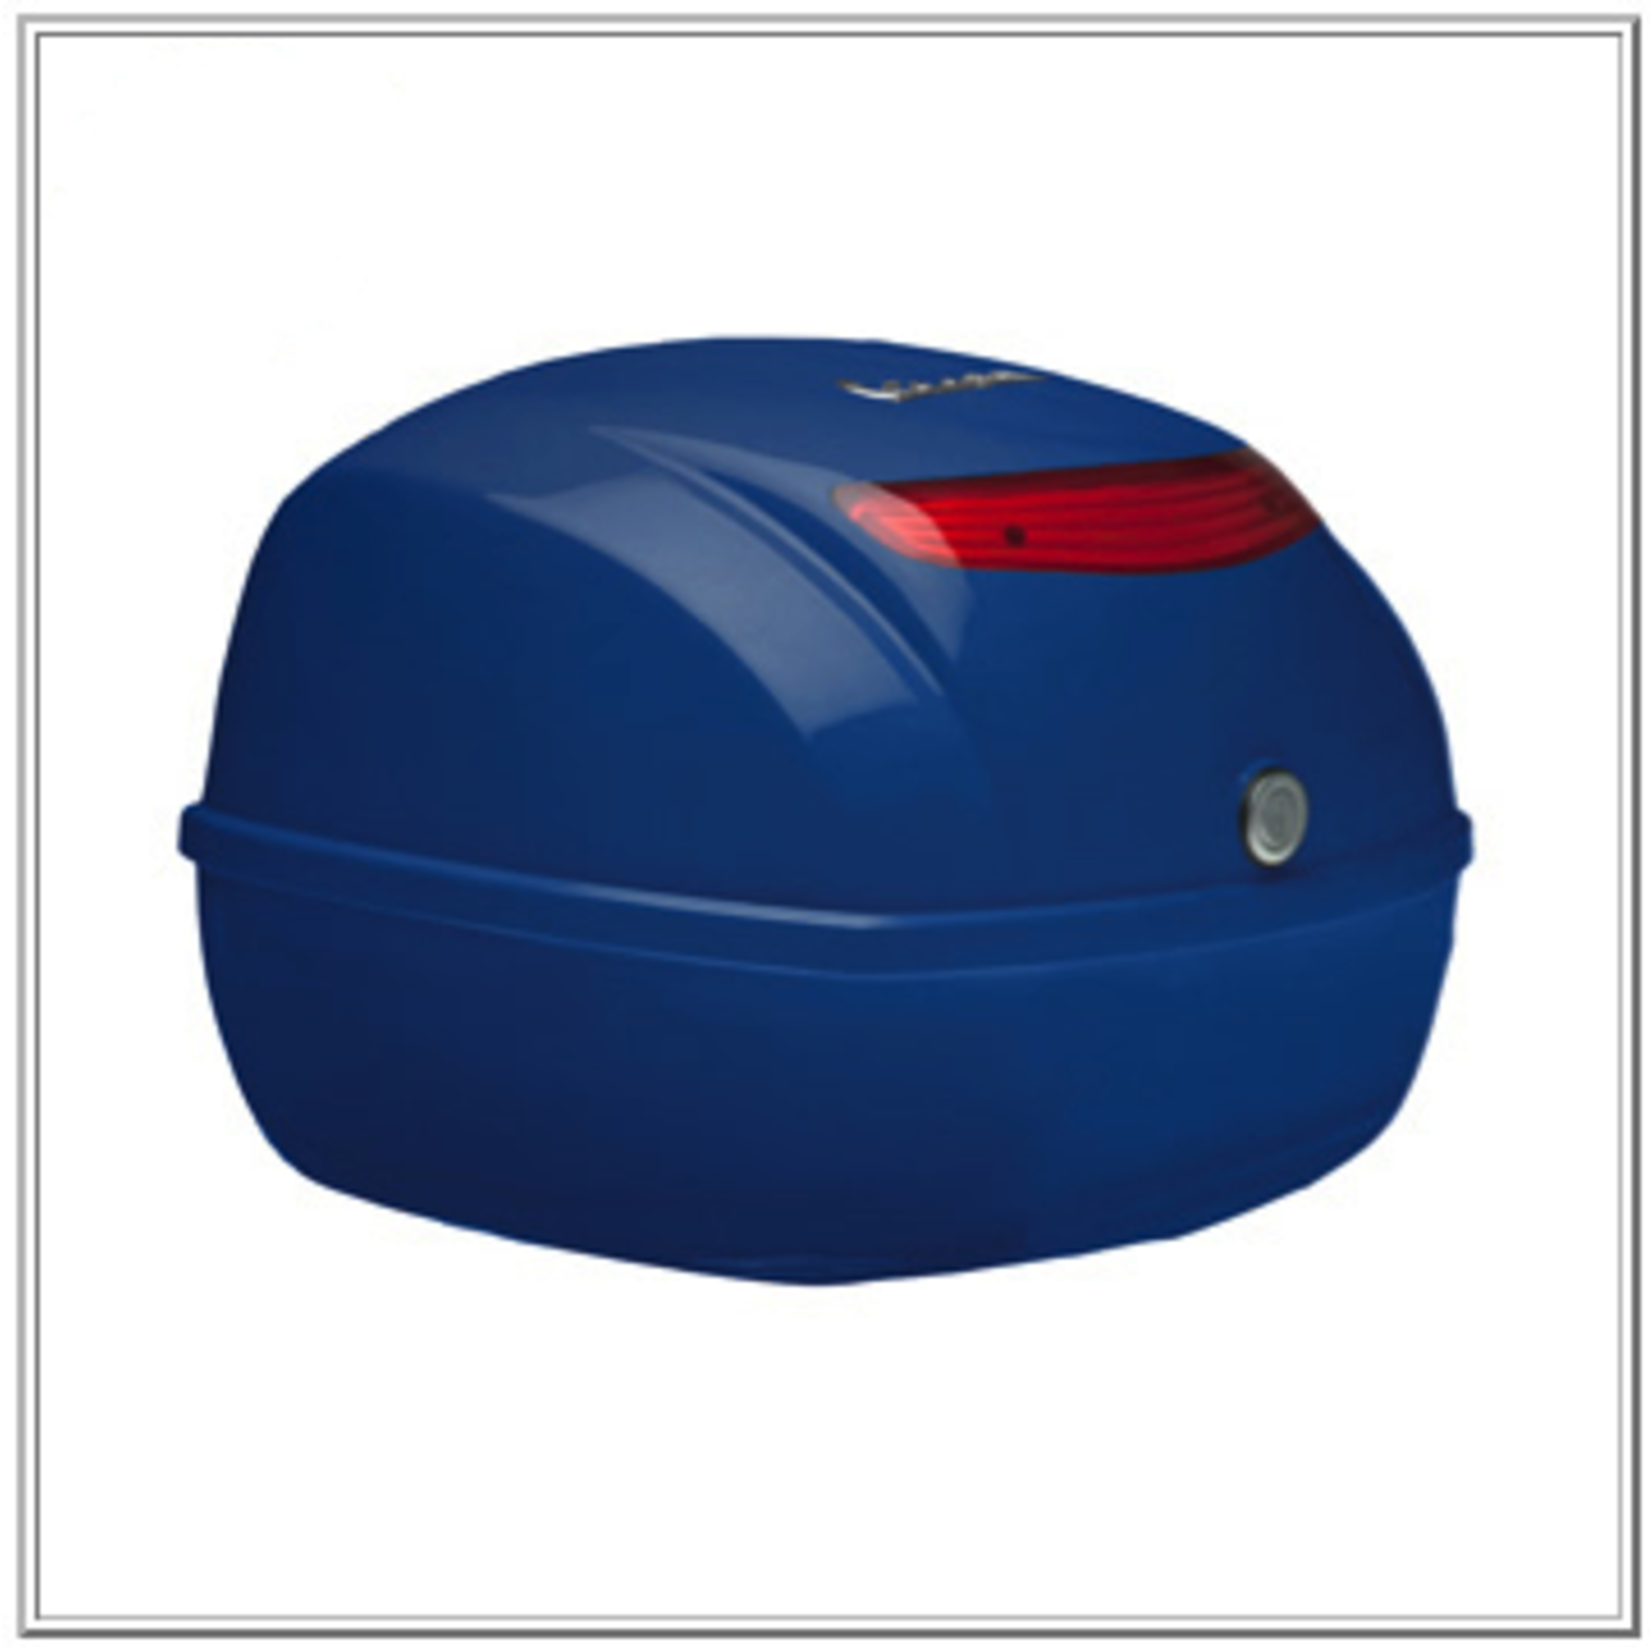 Accessories Top Case, S50 Mediterranean Blue (Requires 657083 Rack)